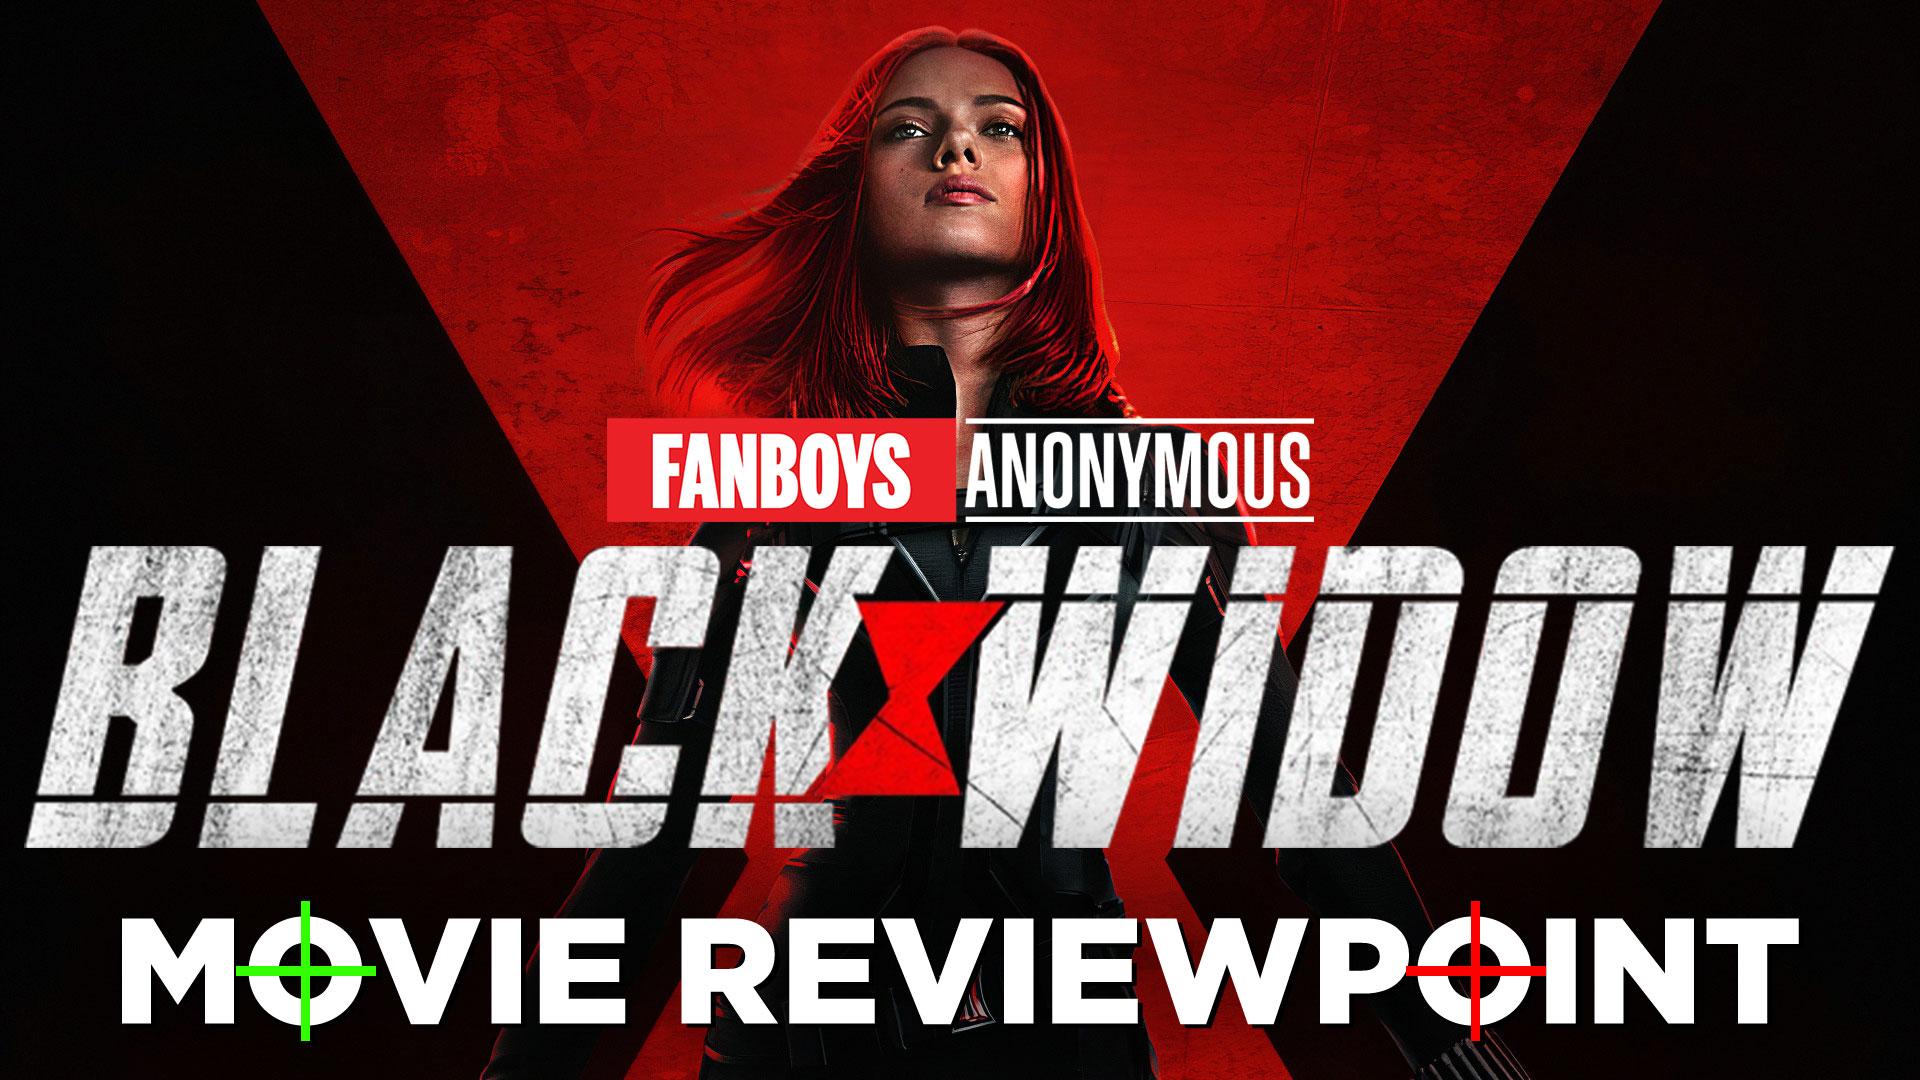 HD wallpaper Black Widow review